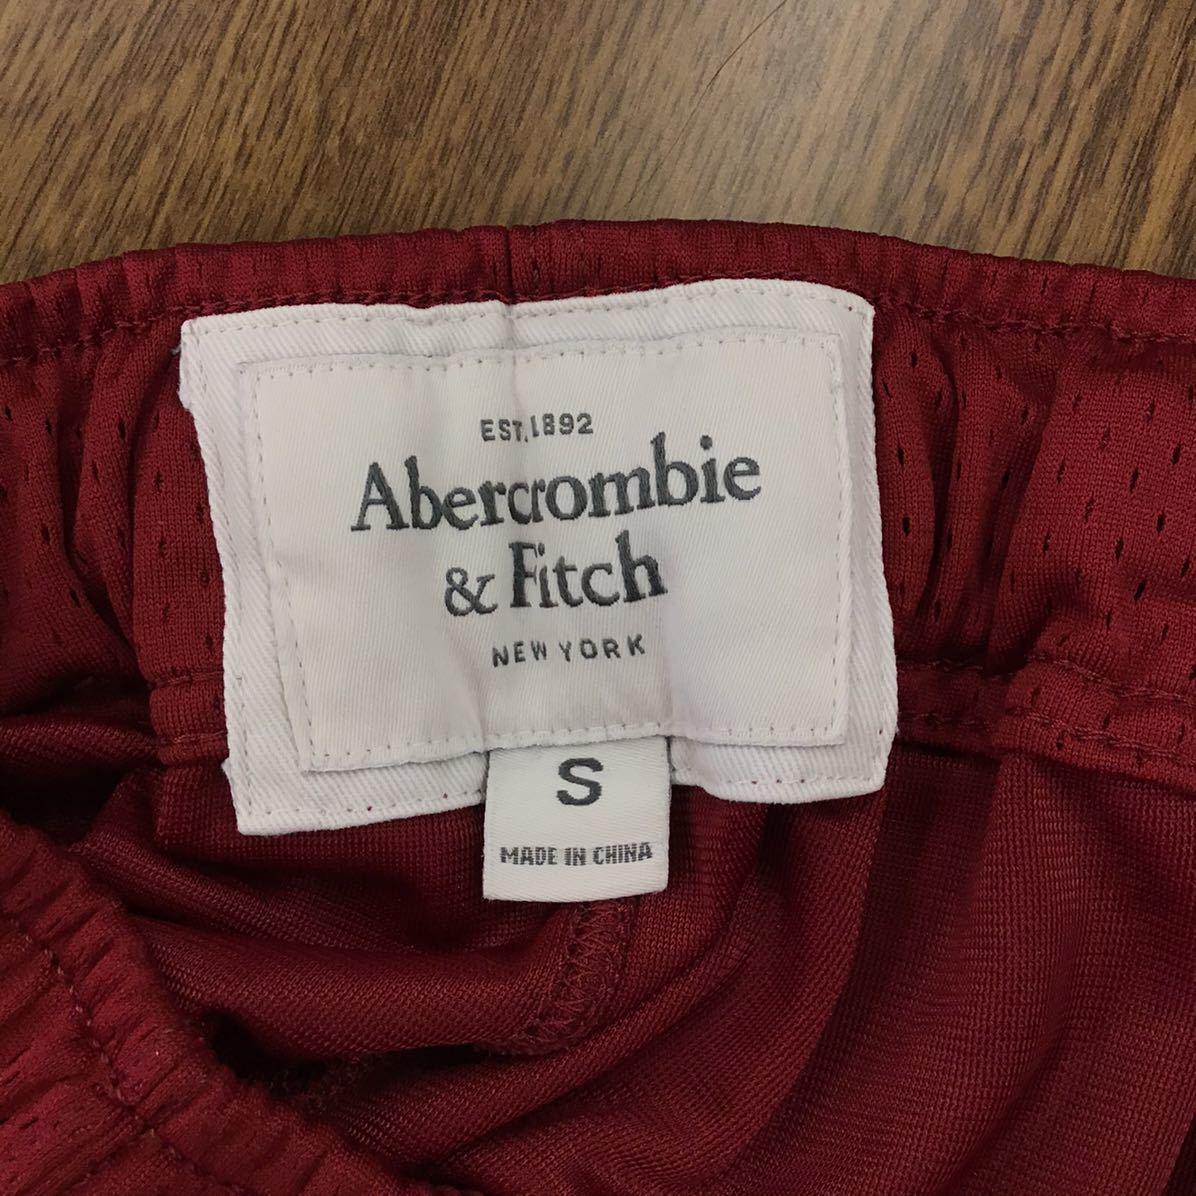 Abercrombie&Fitch Sサイズ ショートパンツ レッド ジャージハーフパンツ ブランド古着 アバクロンビー&フィッチ 赤色 送料無料 F077